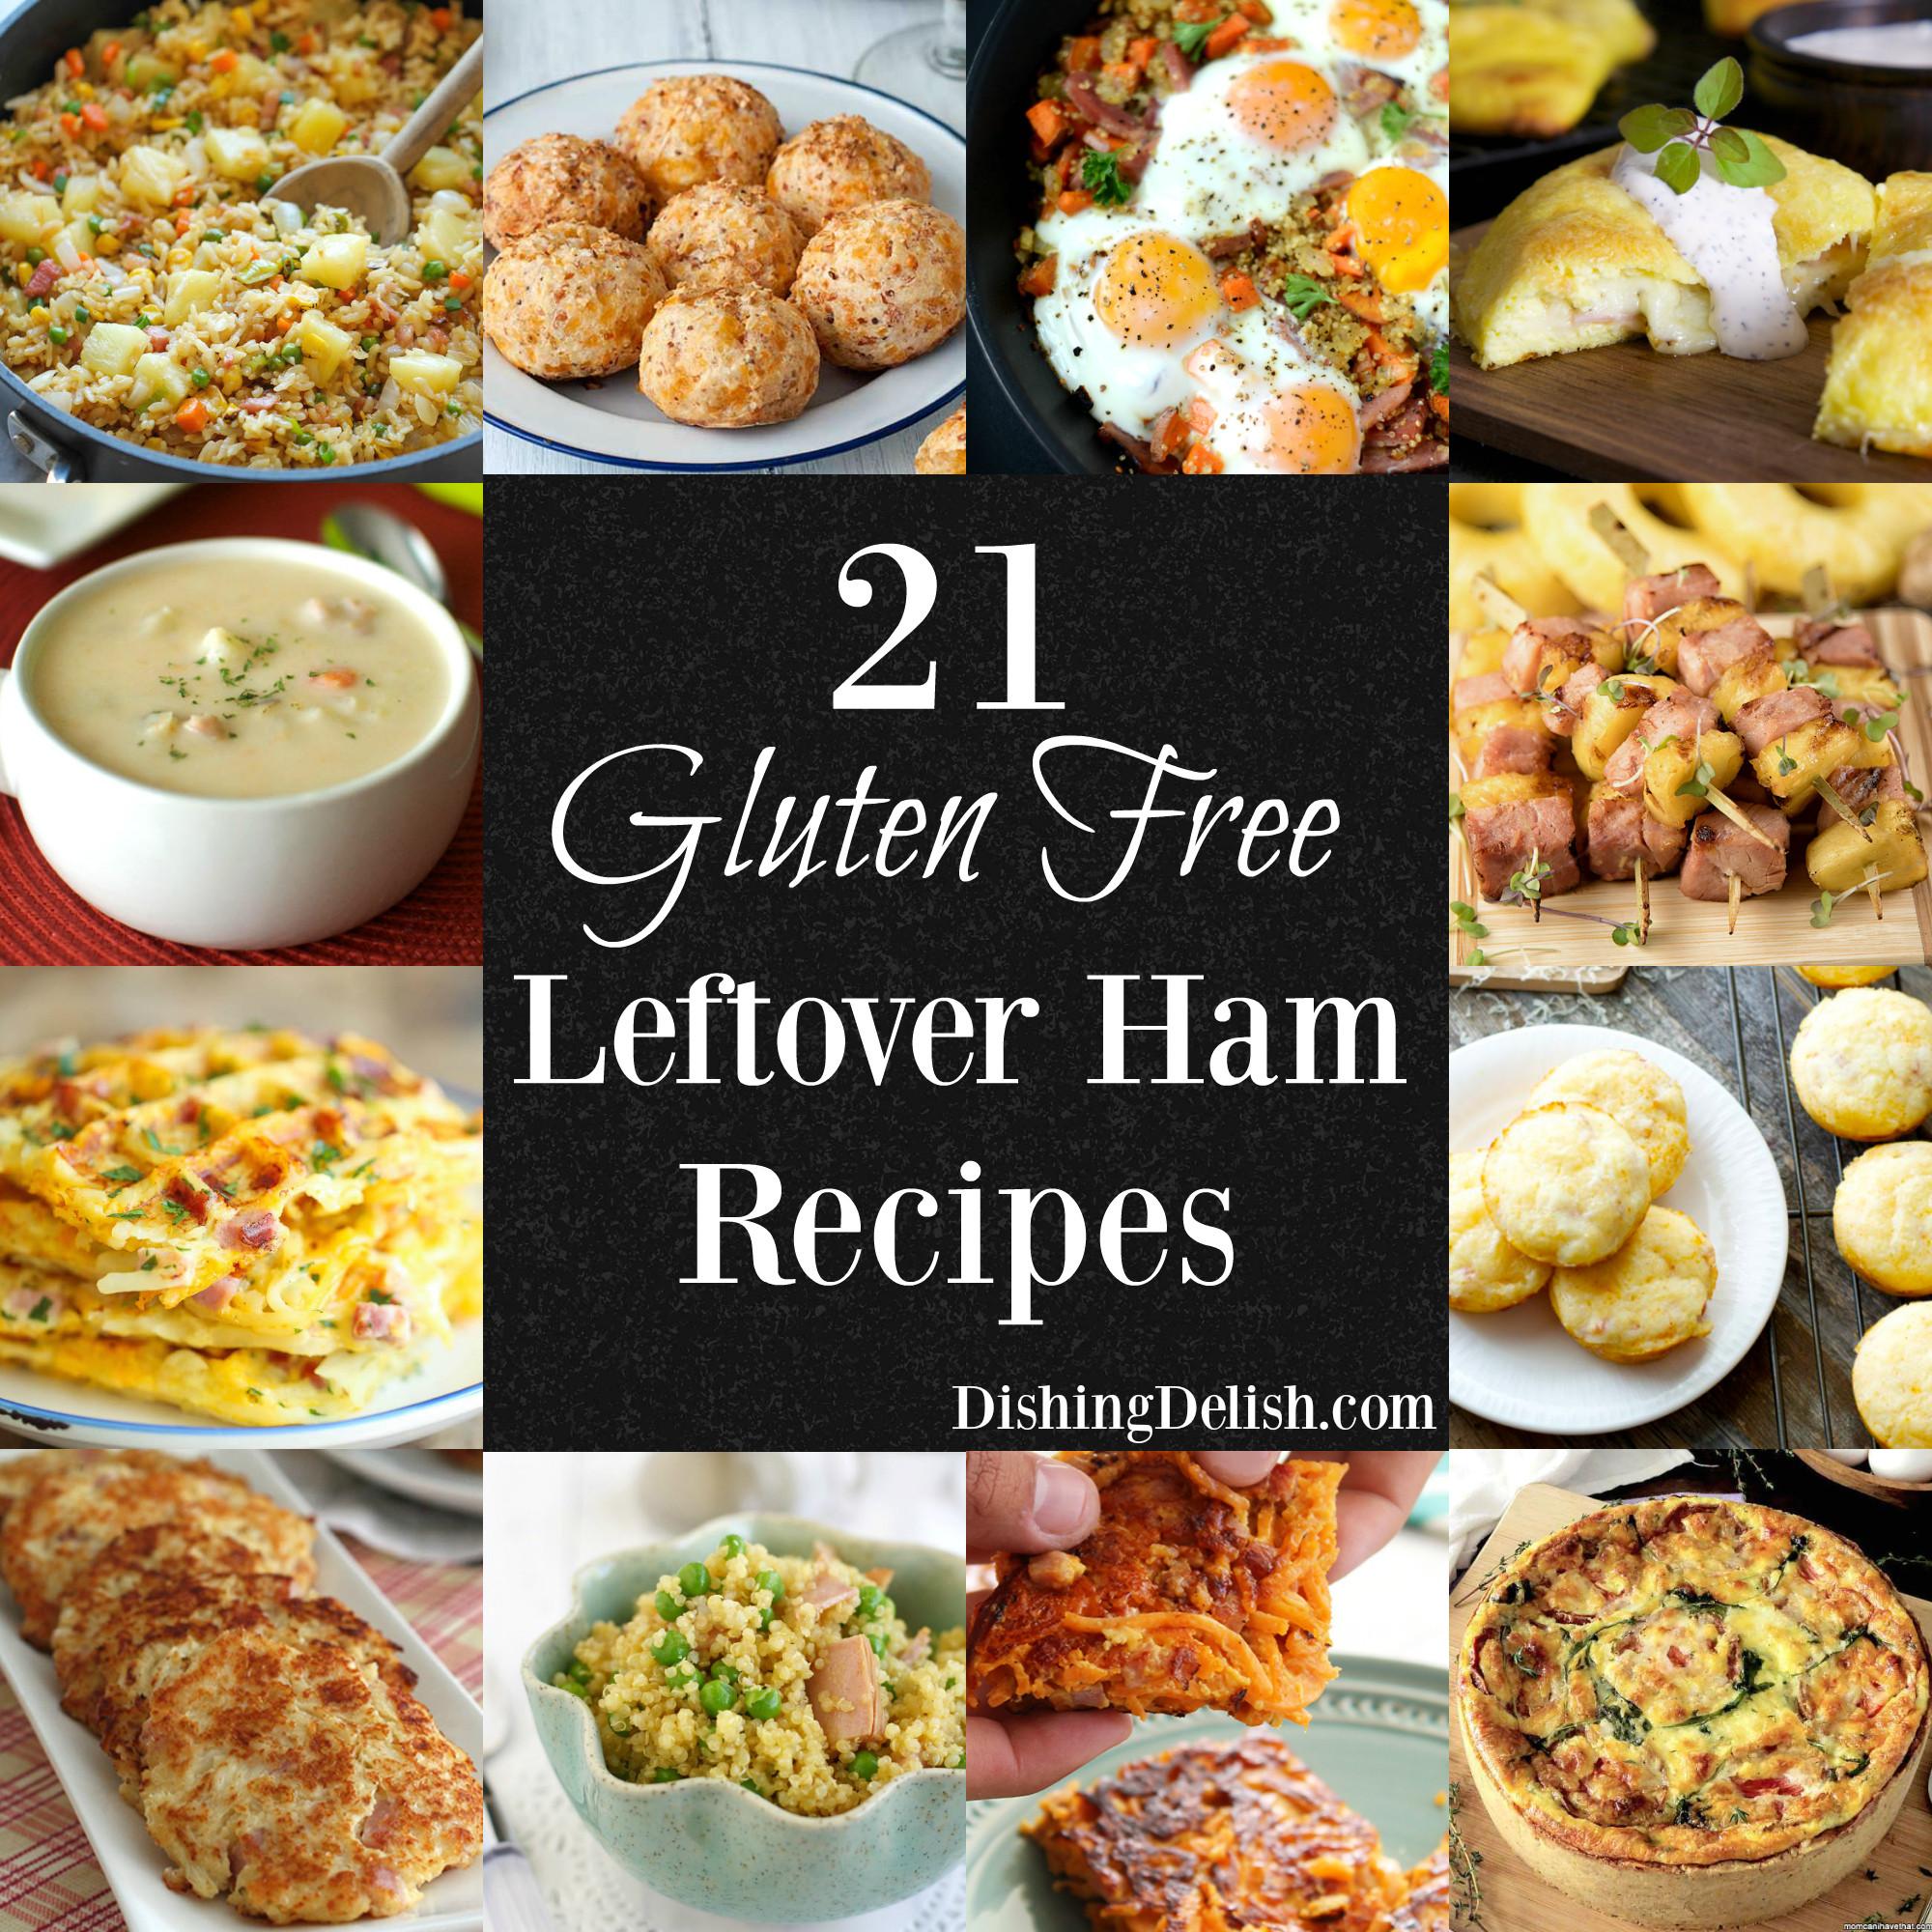 Gluten Free Food Recipes  21 Gluten Free Leftover Ham Recipes Dishing Delish